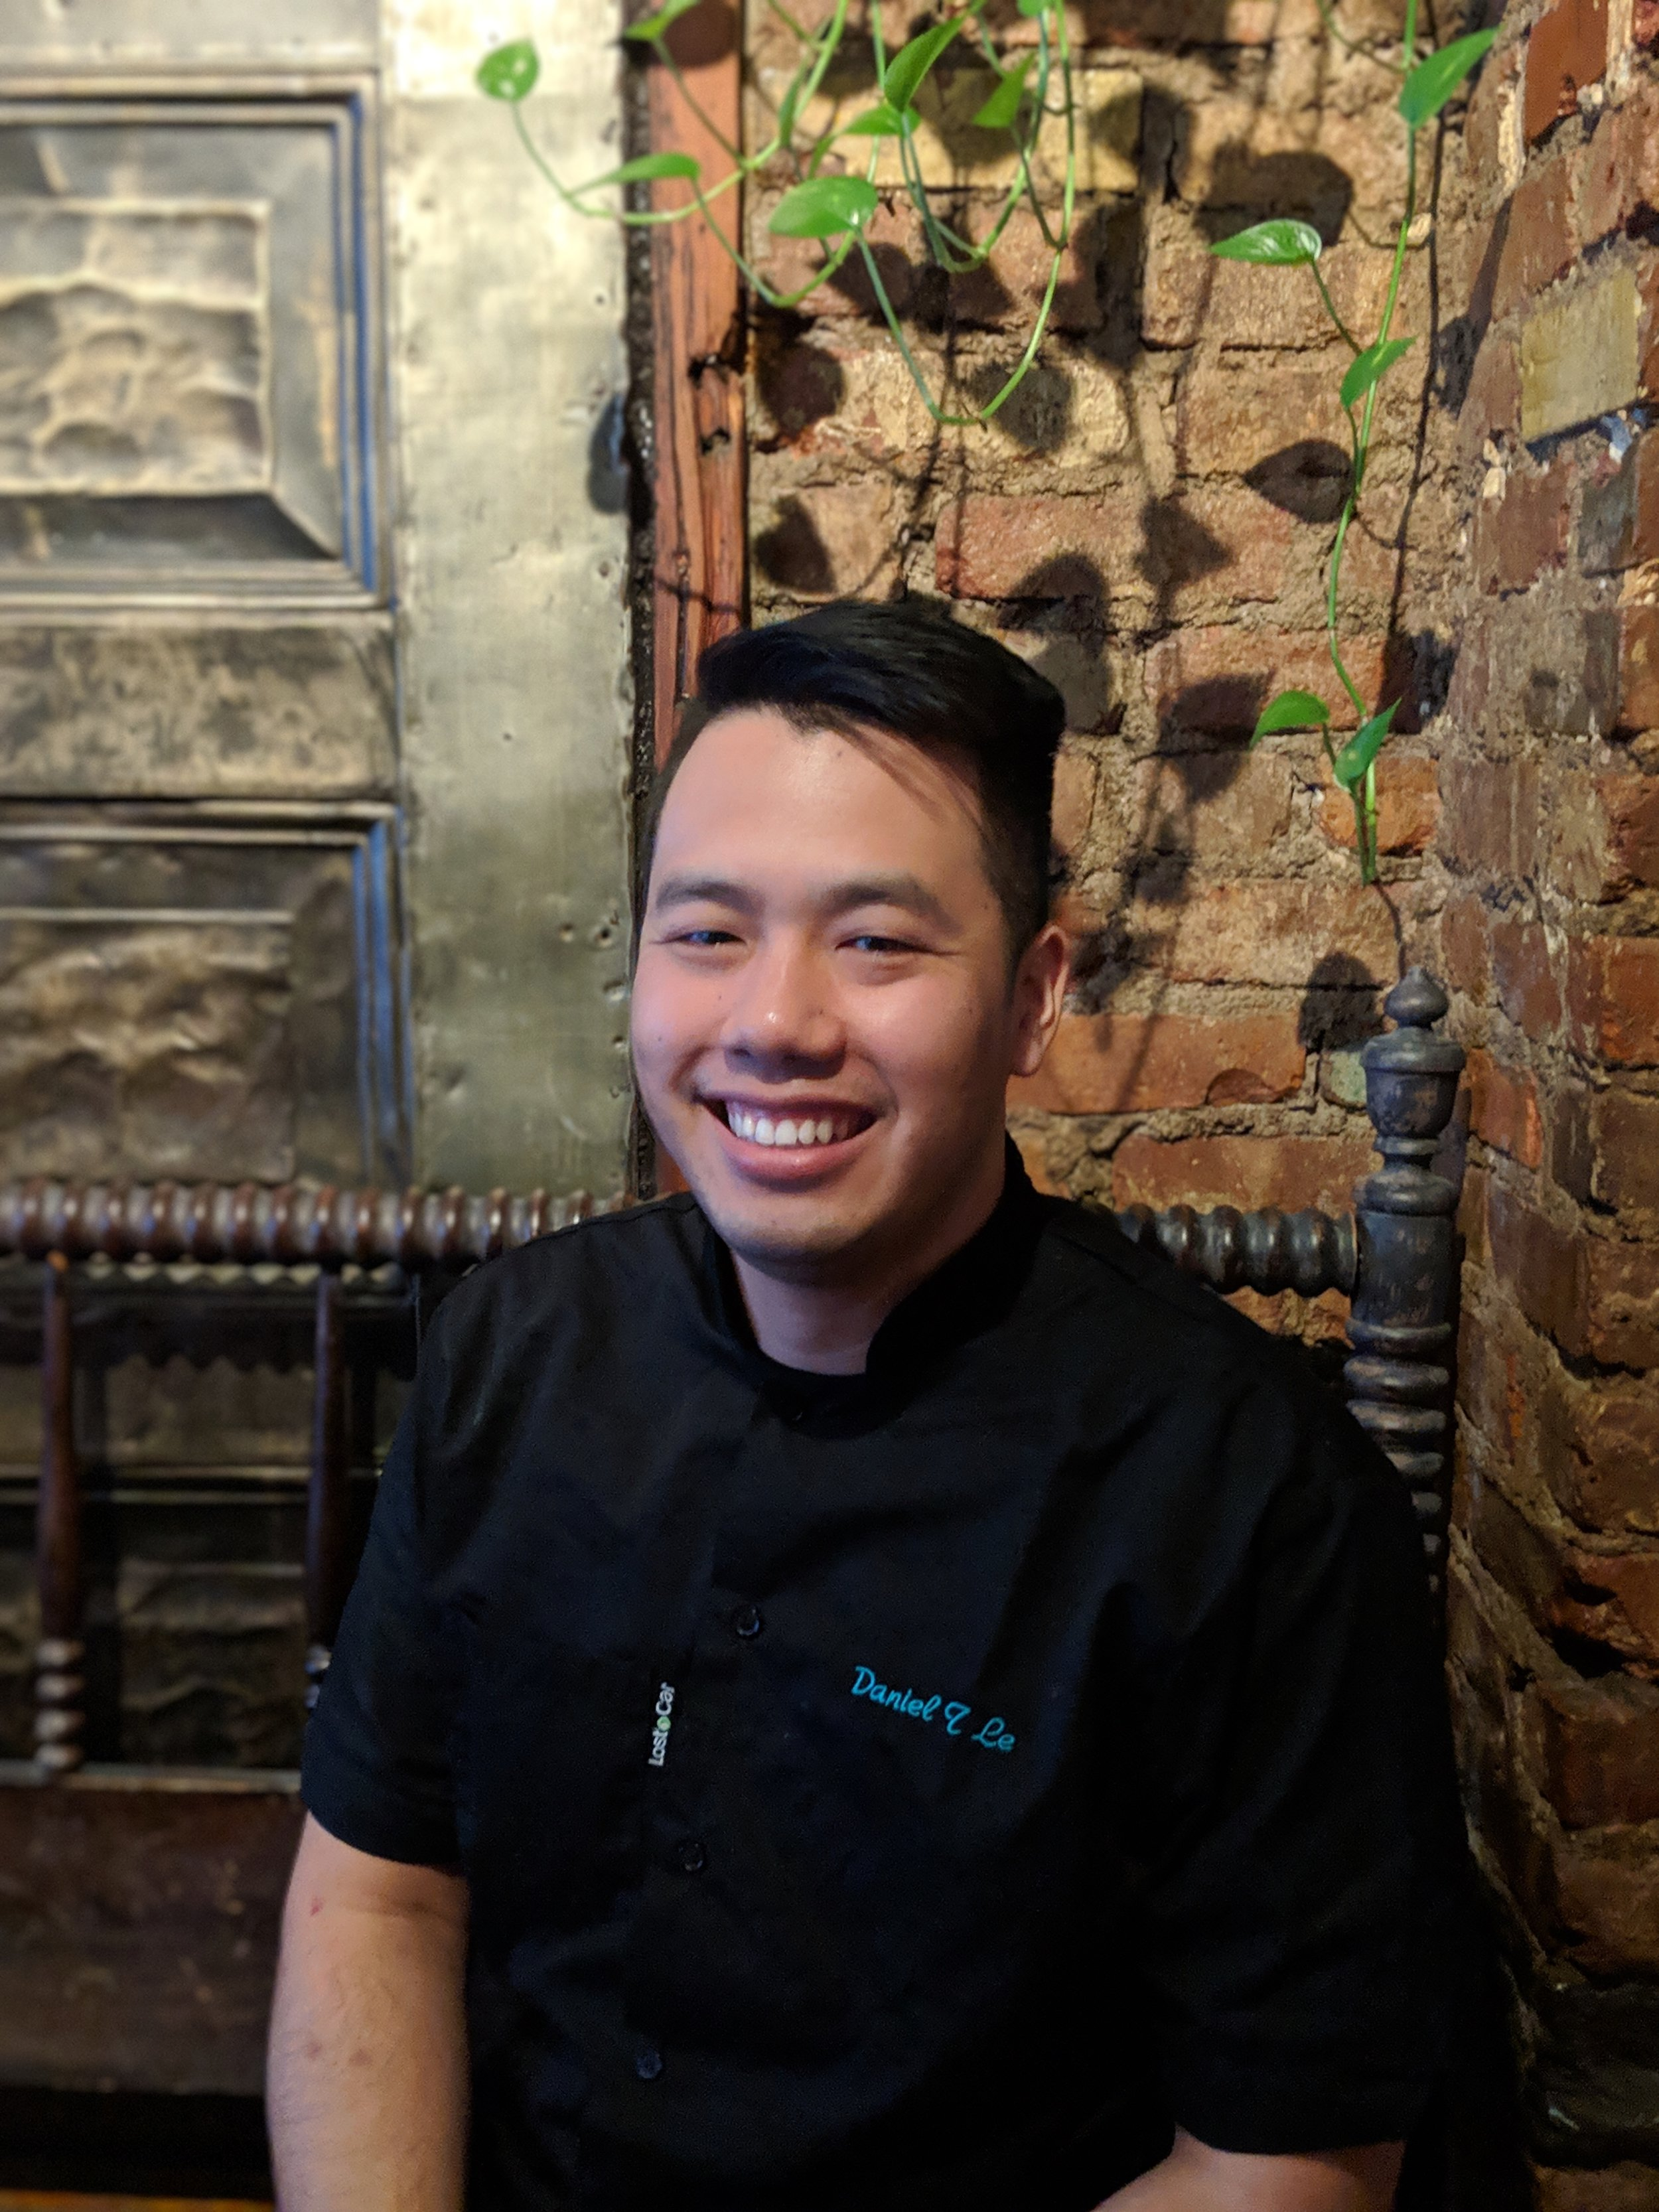 Chef Daniel Le of Hanoi House